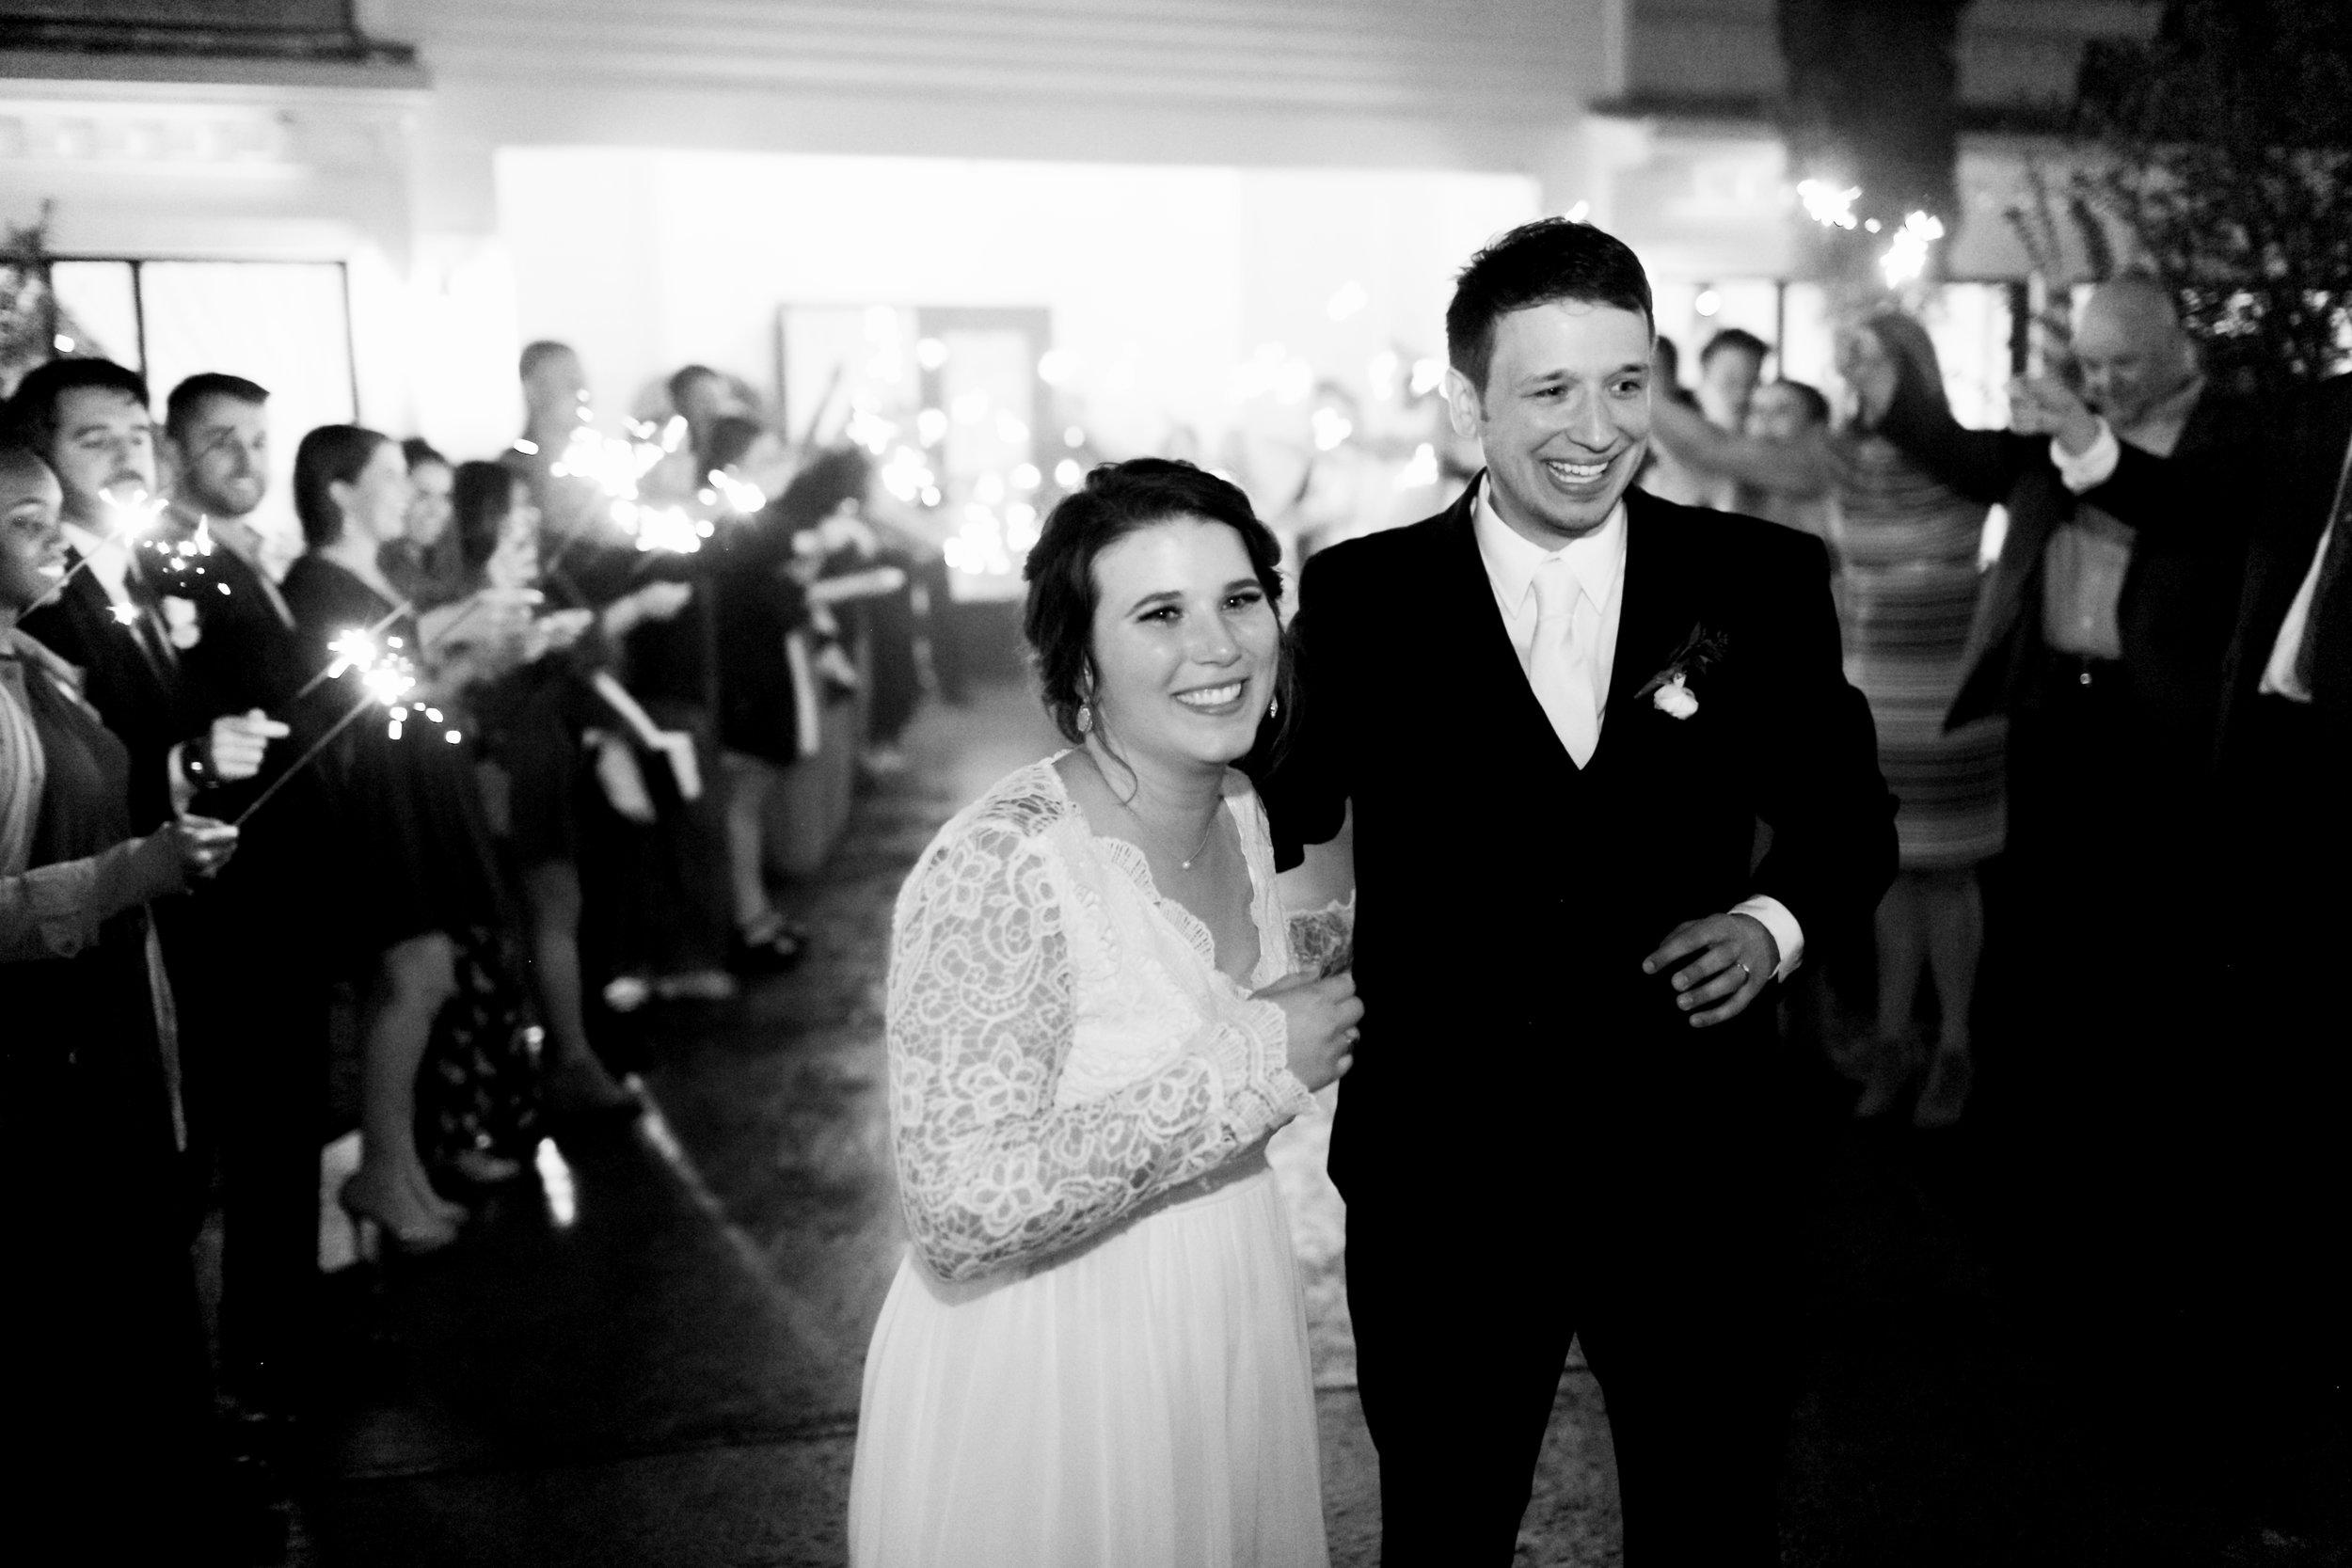 Austin_Texas_Fine_Art_Wedding_Photographer_Kayla_Snell_Photography_Antebellum_Oaks813.jpg